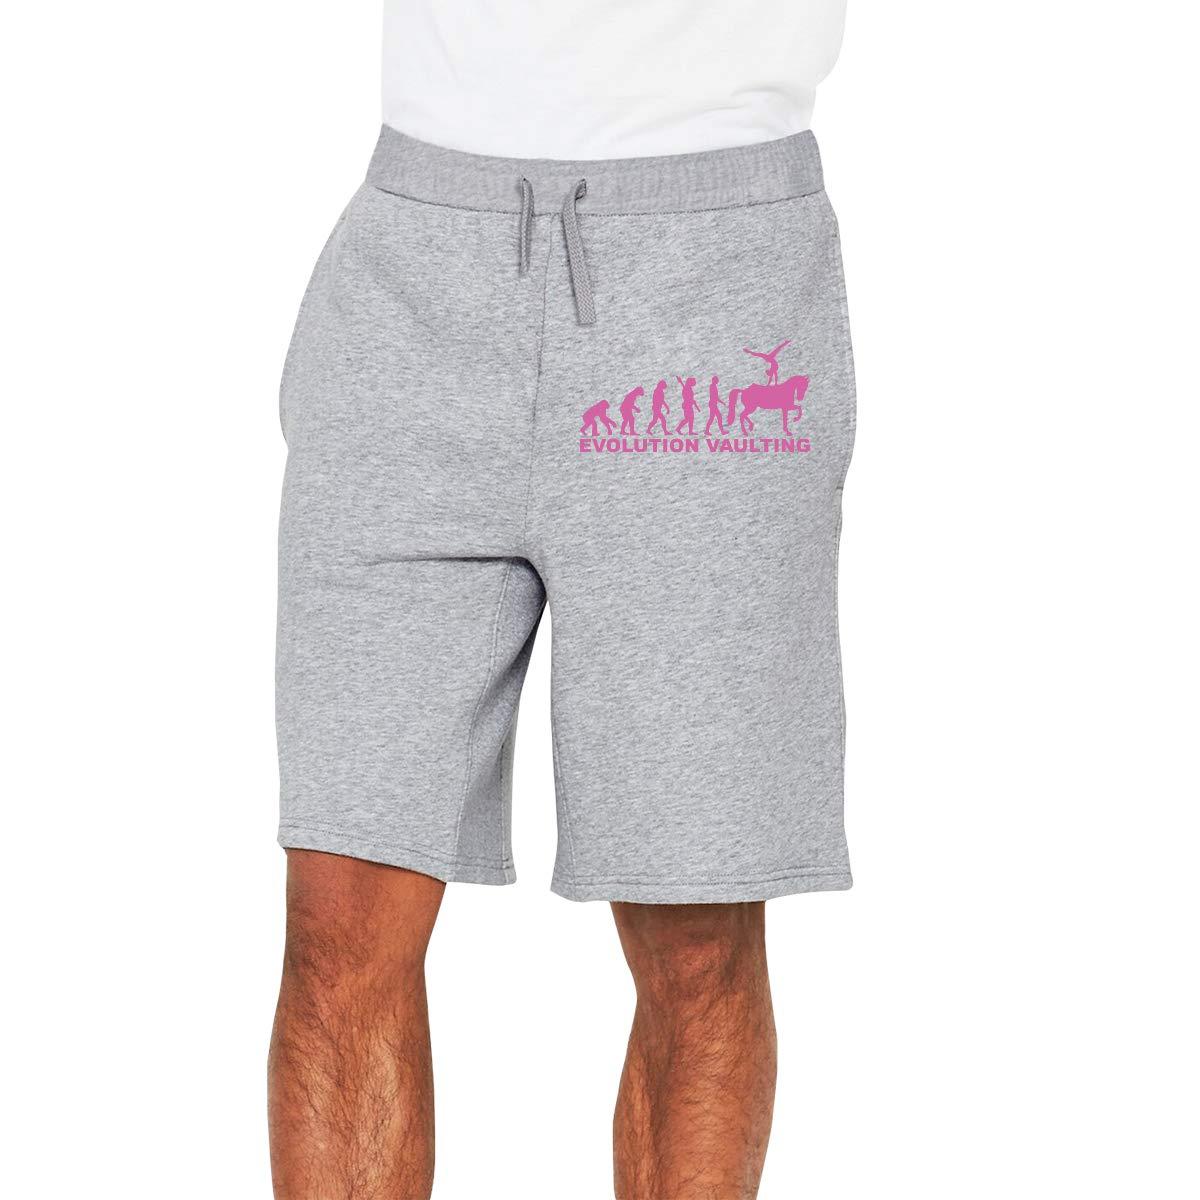 Yecx-1 Mens Horse Vaulting Evolution Jogger Shorts Pajama Short